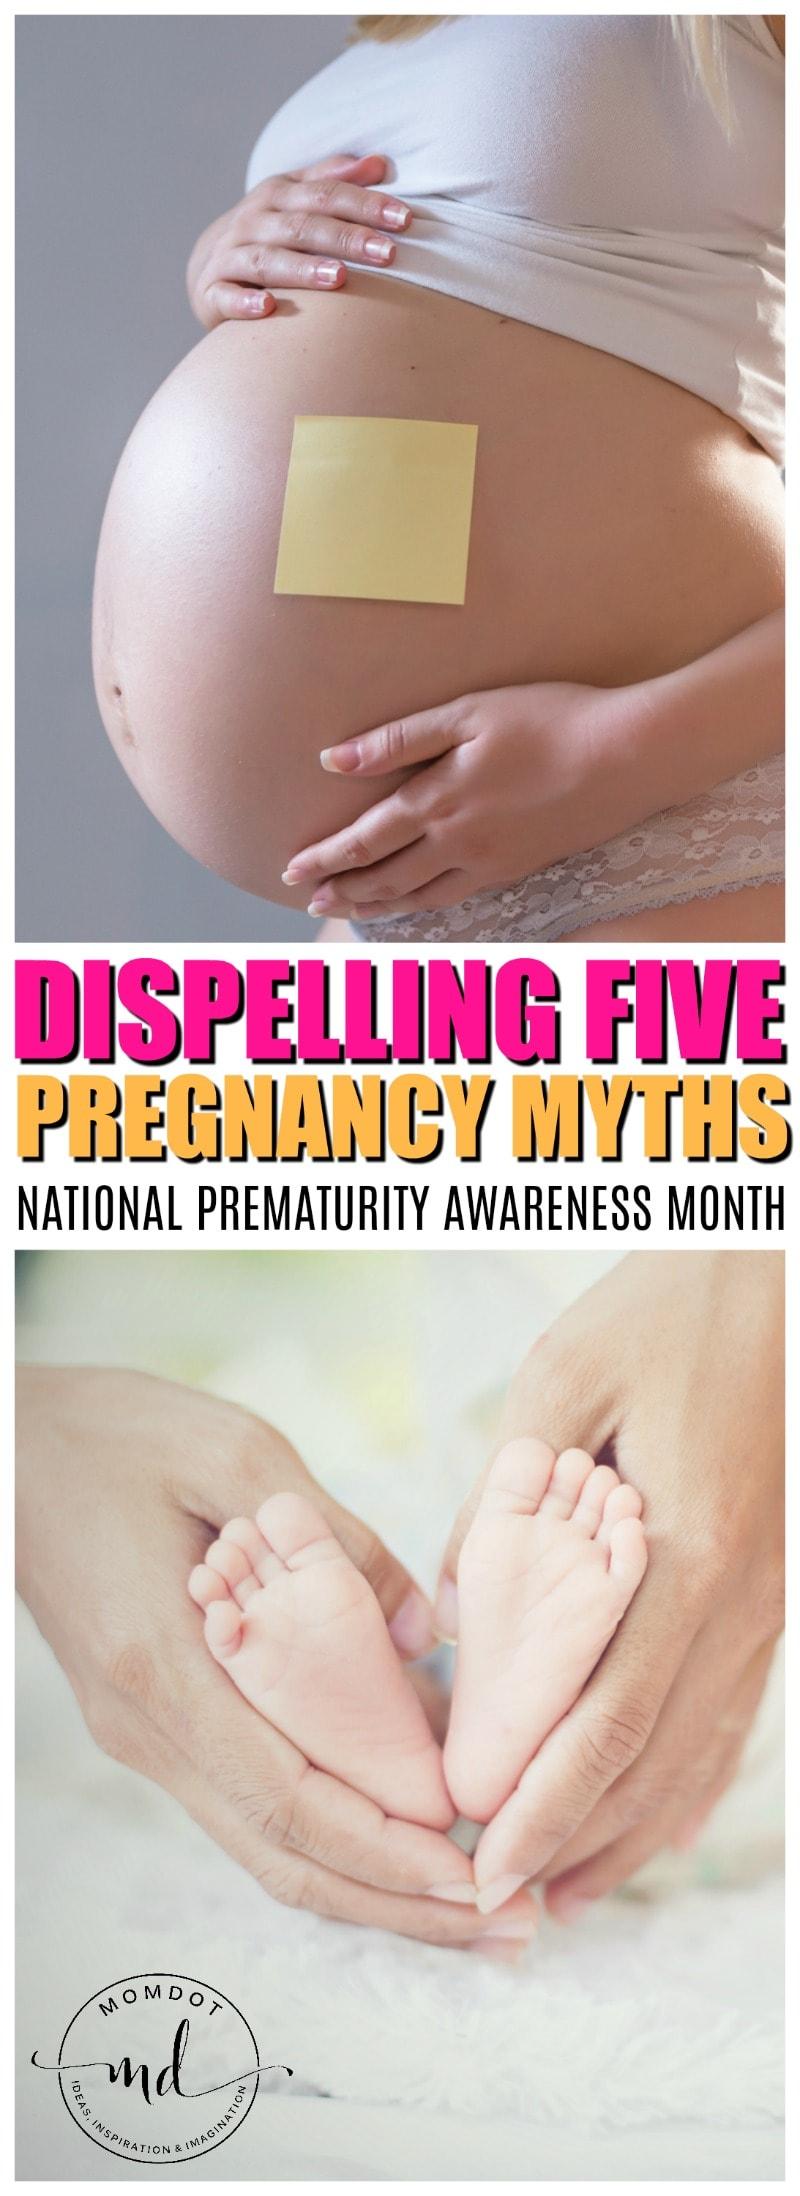 Premature Awareness Month : Dispelling 5 Pregnancy Myths